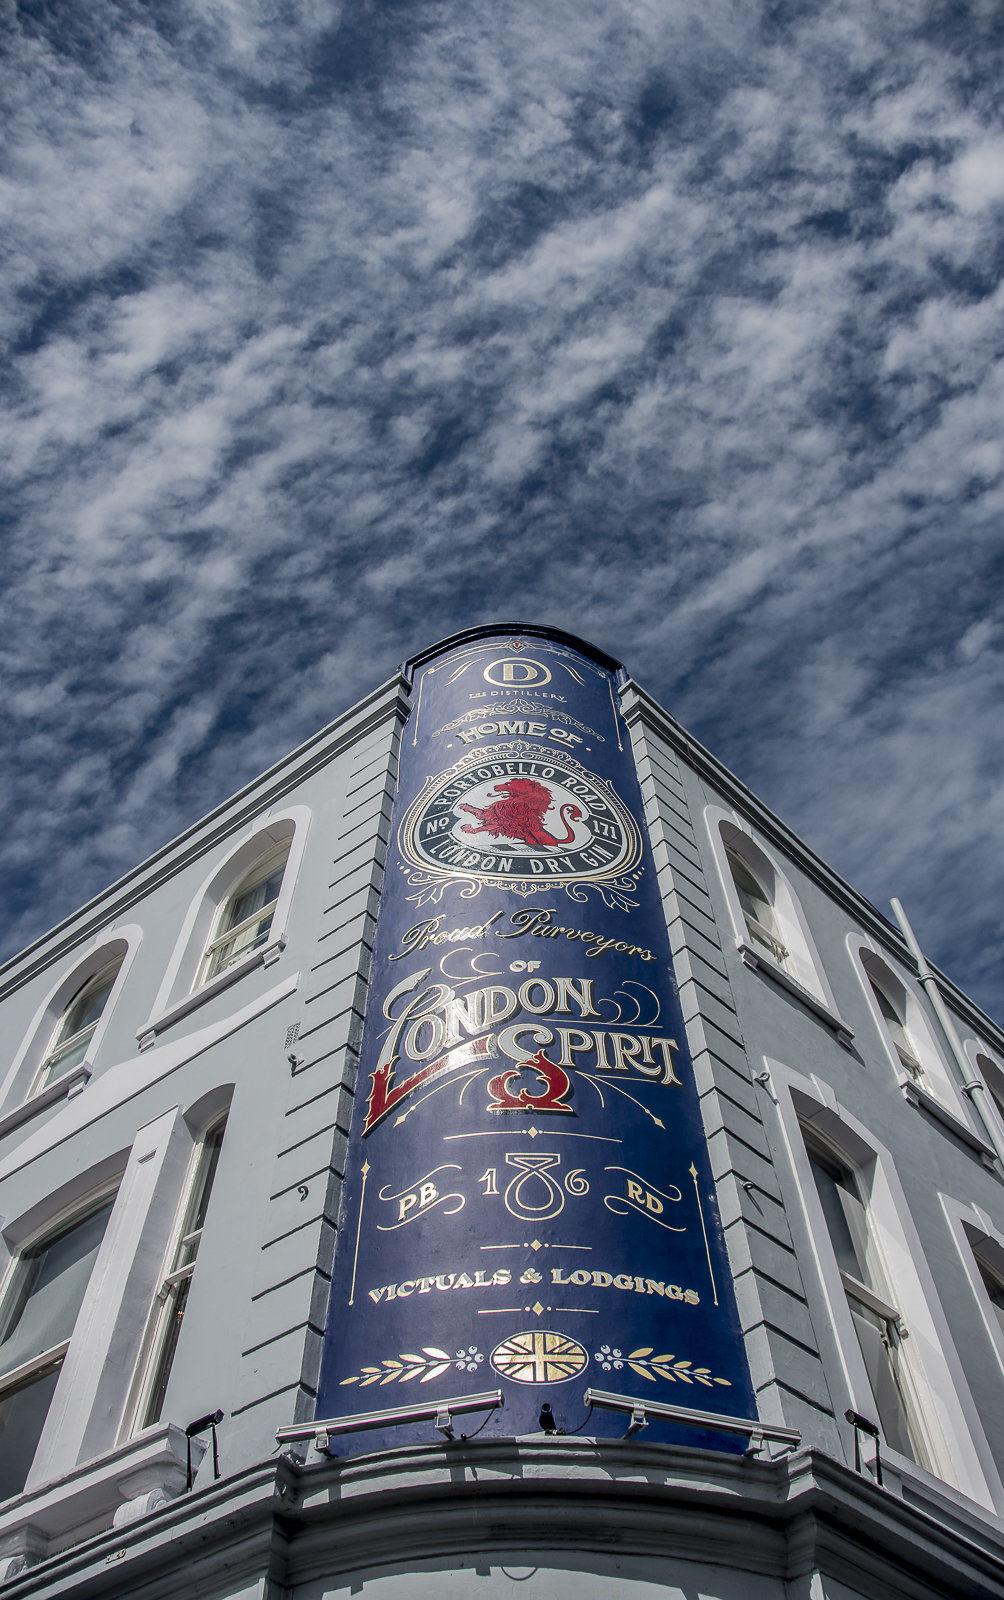 London Spirit advert, Portobello Road, London